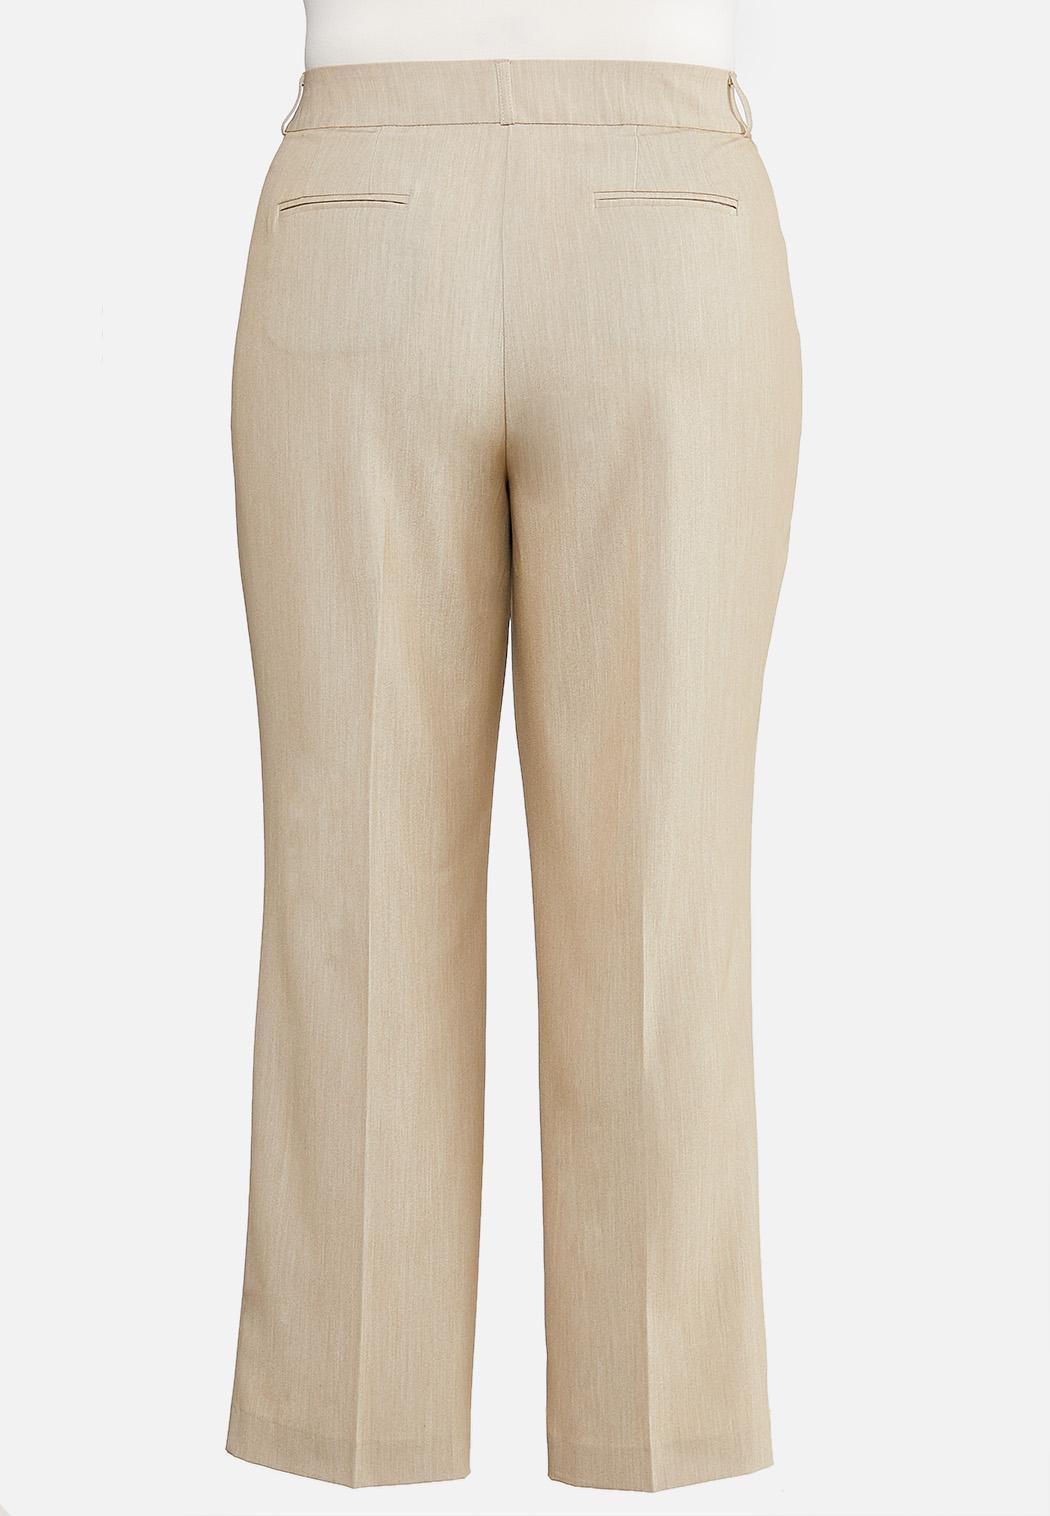 Plus Size Tan Trouser Pants (Item #44474040)